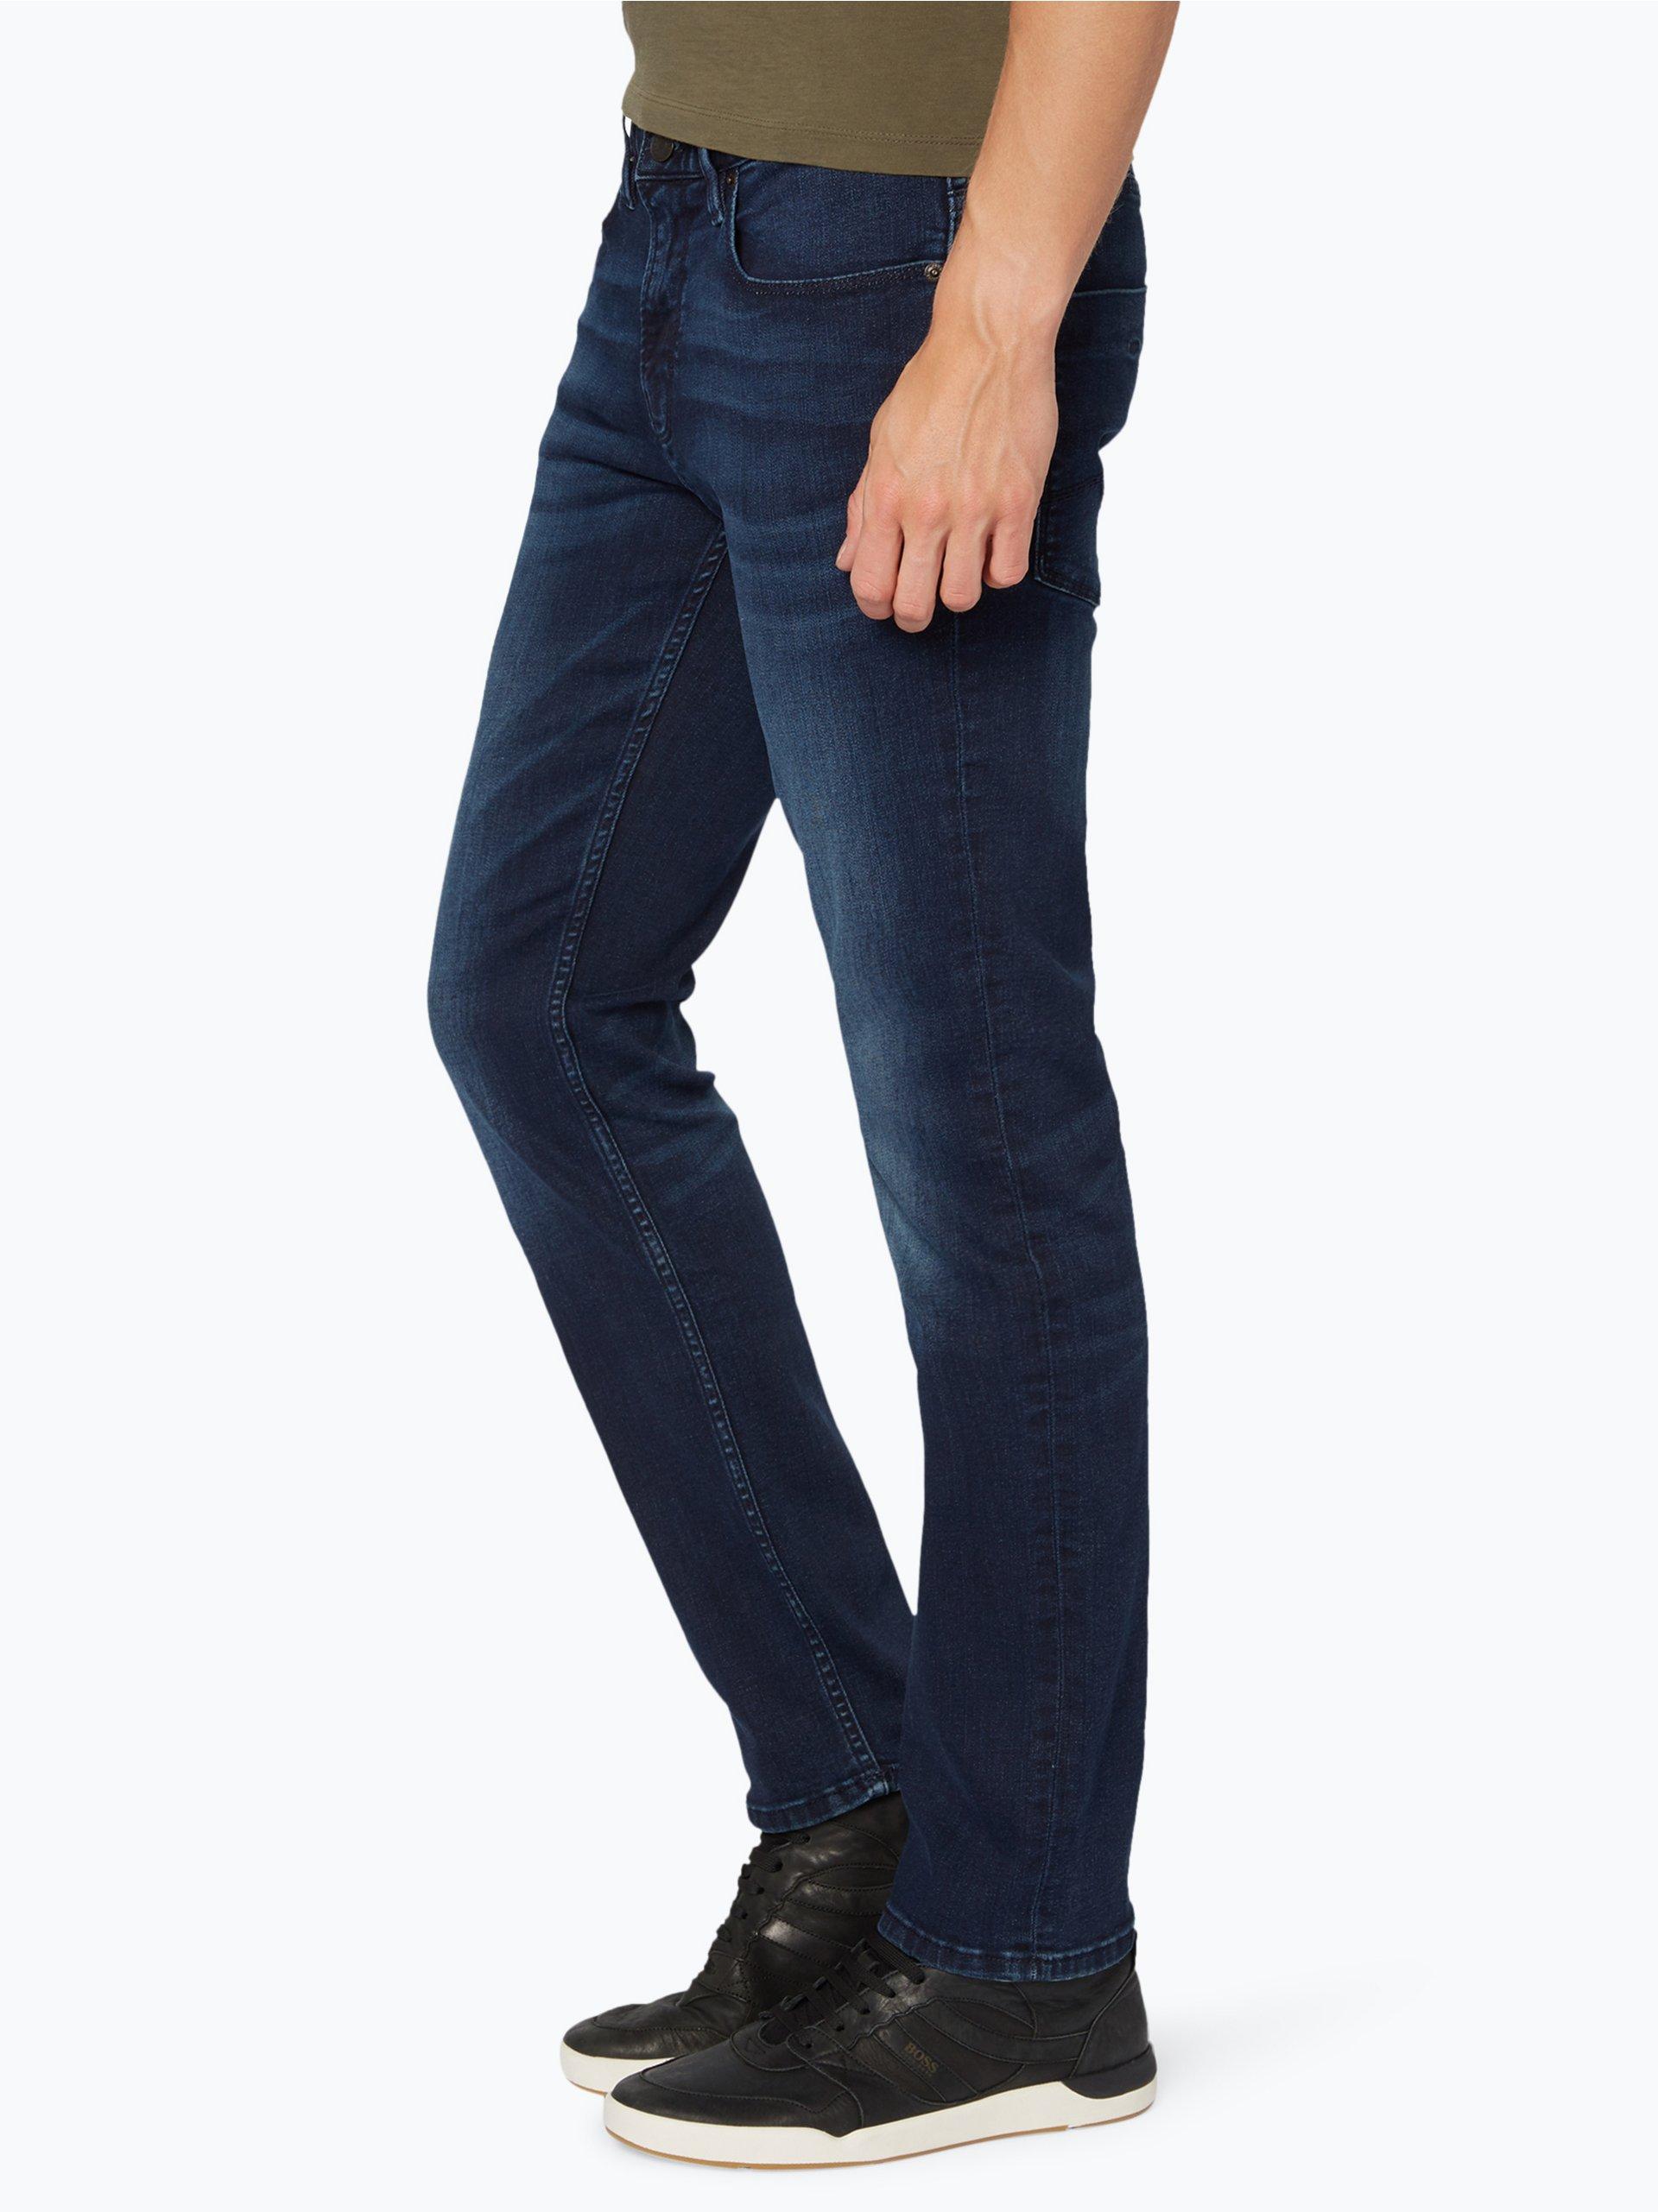 boss casual herren jeans orange 63 dark stone uni online kaufen vangraaf com. Black Bedroom Furniture Sets. Home Design Ideas